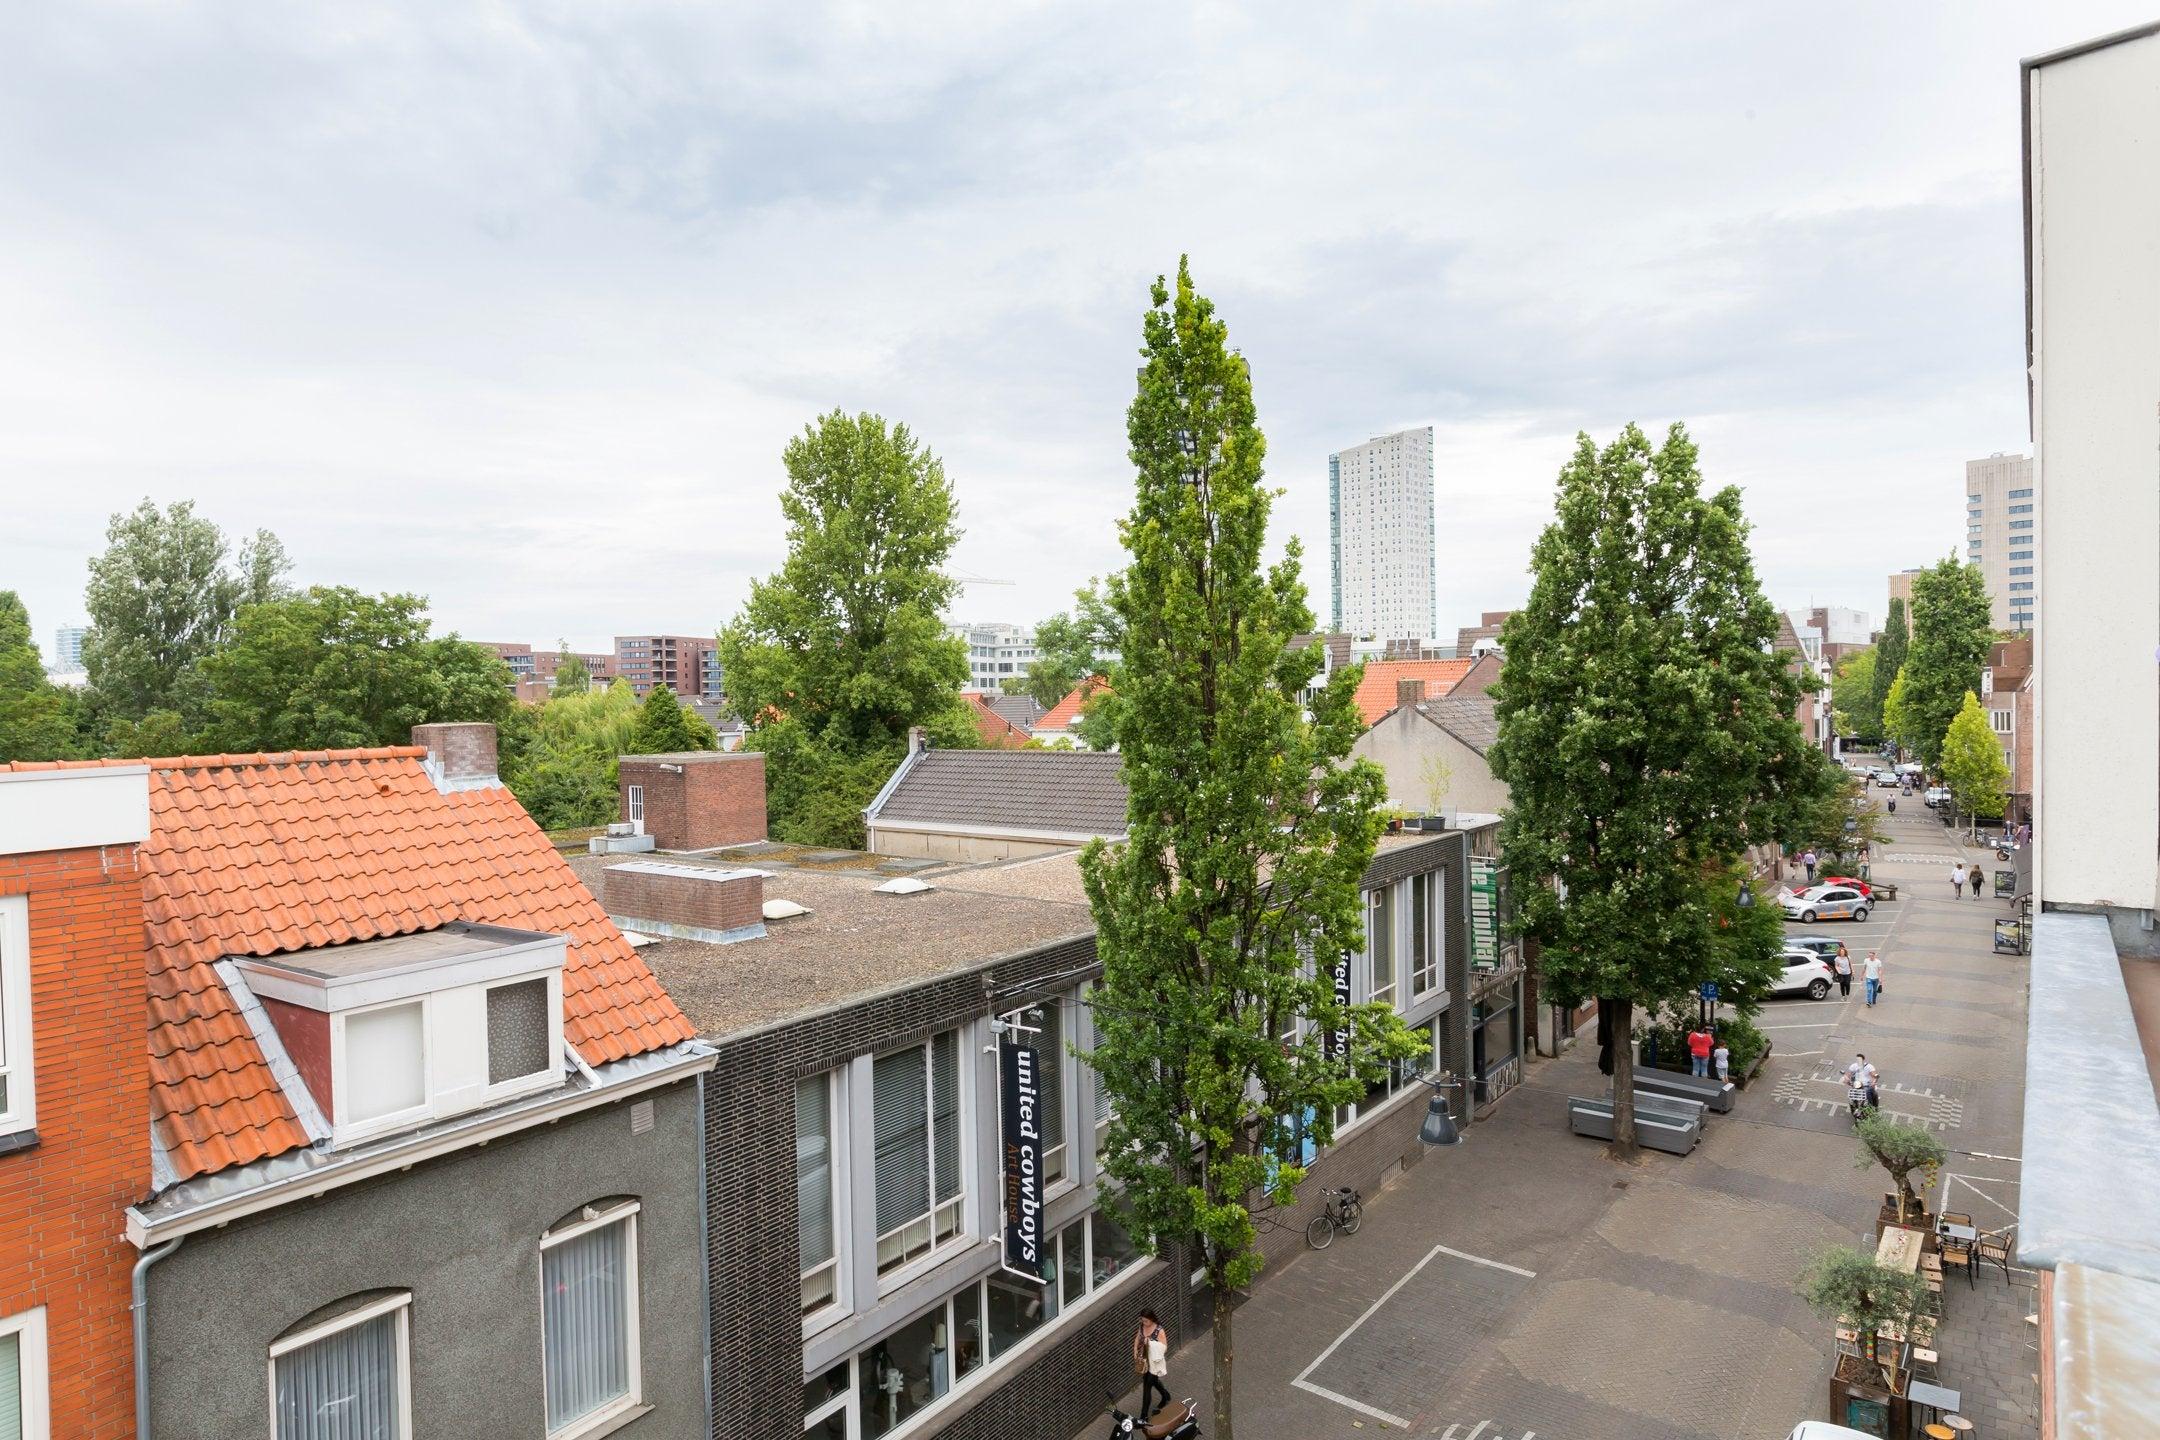 https://public.parariusoffice.nl/298/photos/huge/51313508.1502368347-168.jpg